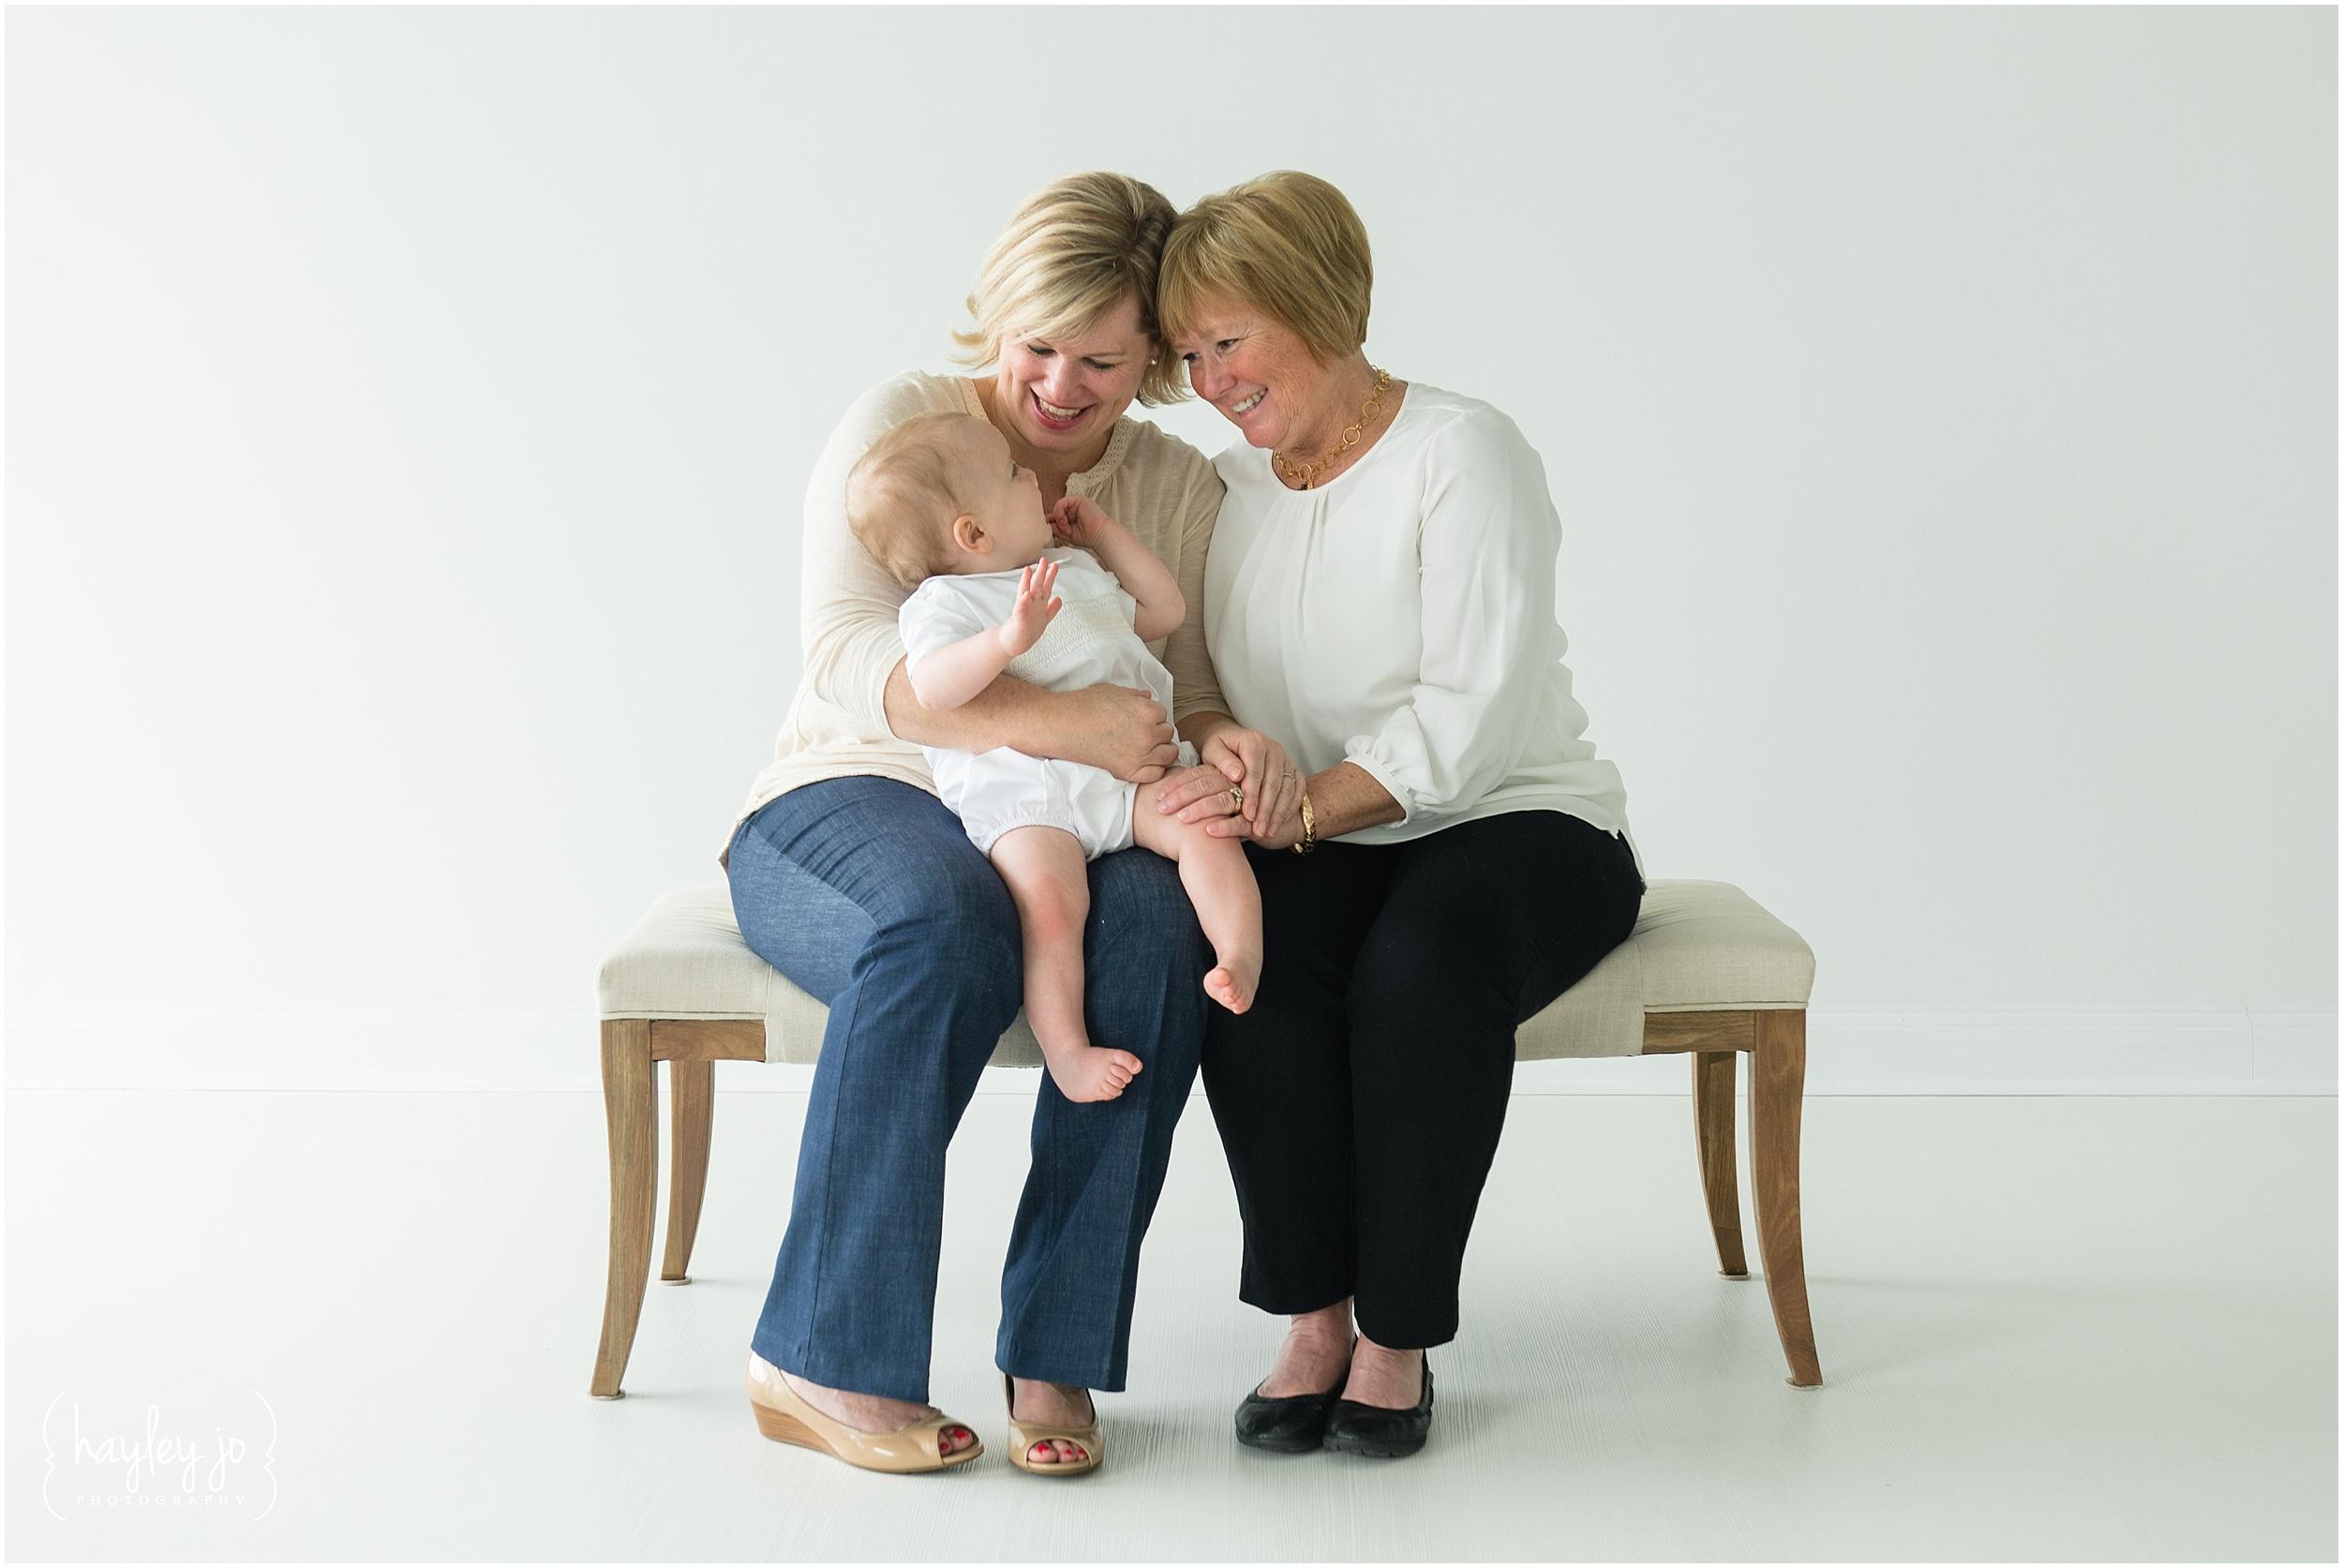 atlanta-newborn-photographer-hayley-jo-photography-atlanta-family-photographer_0108.jpg